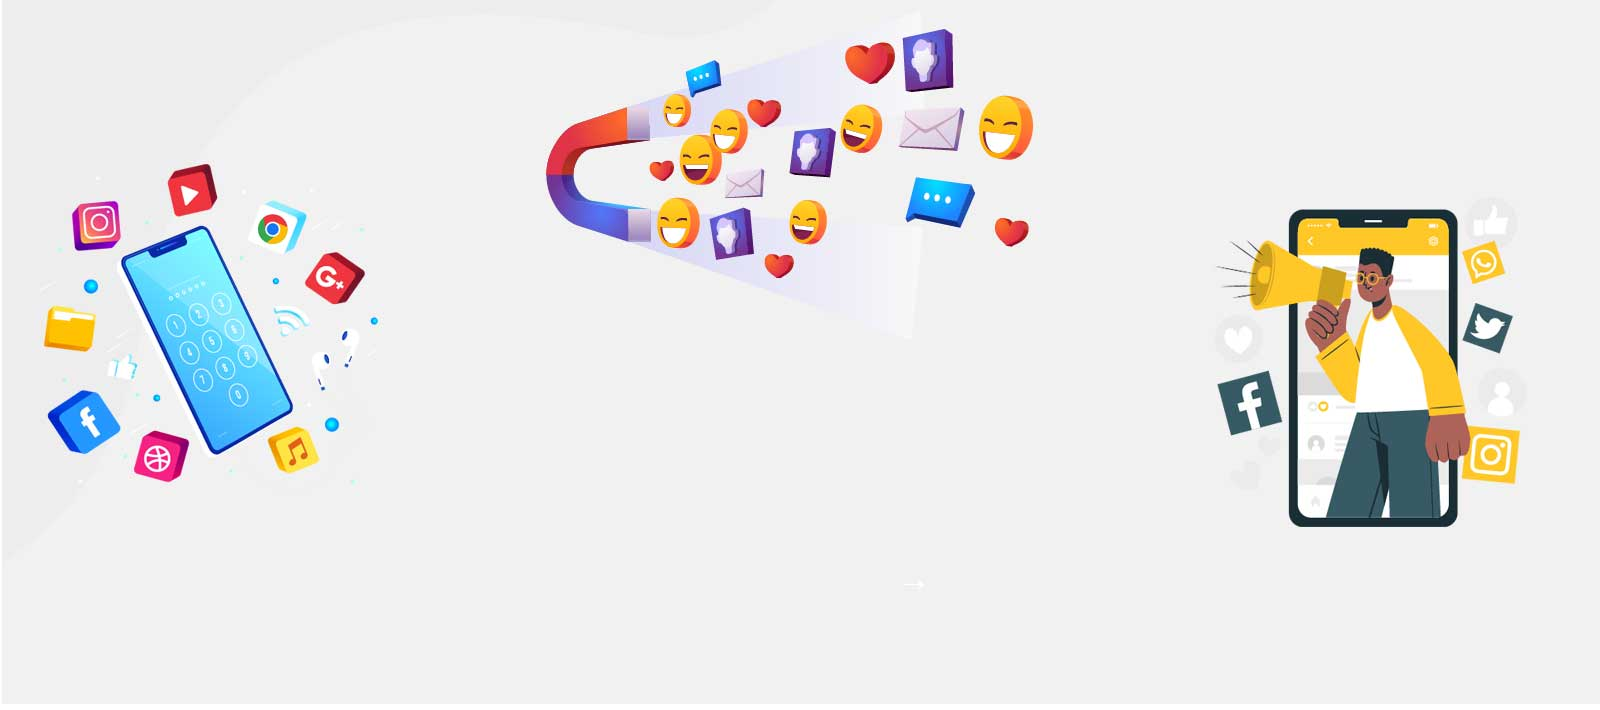 Social Media Marketing Agency in Jaipur | SMM Services